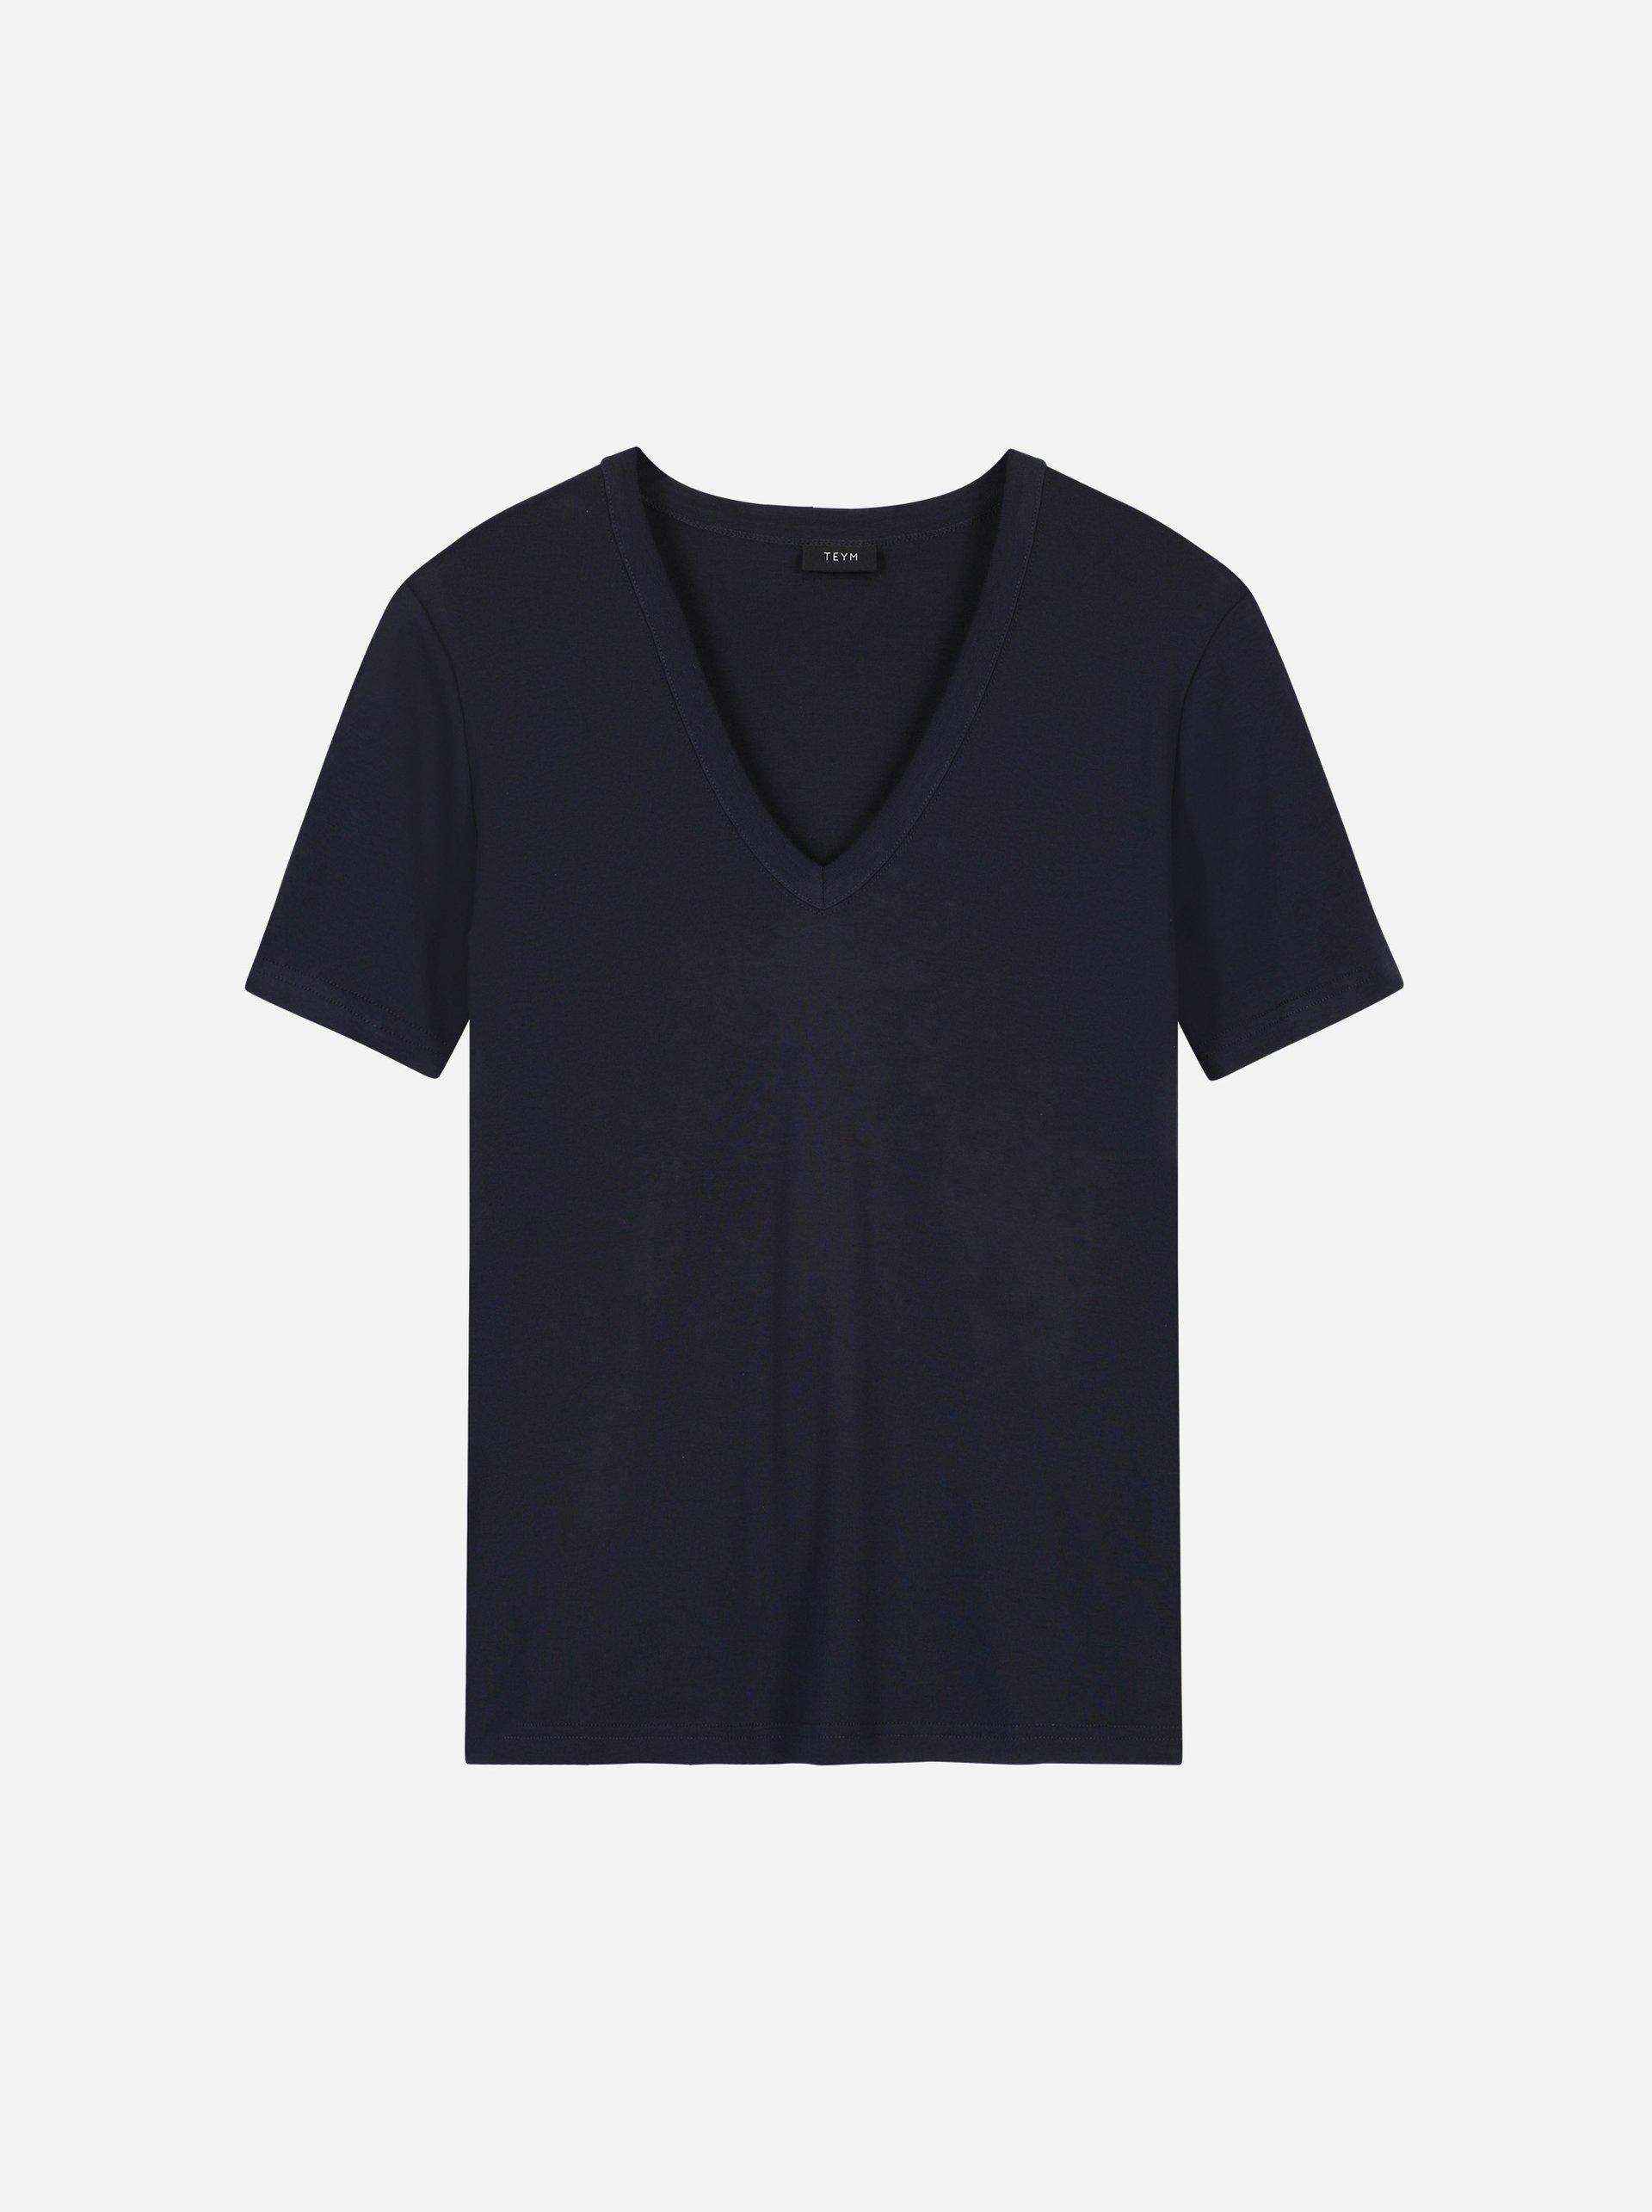 Teym - The T-Shirt - V-Neck - Women - Blue - 6